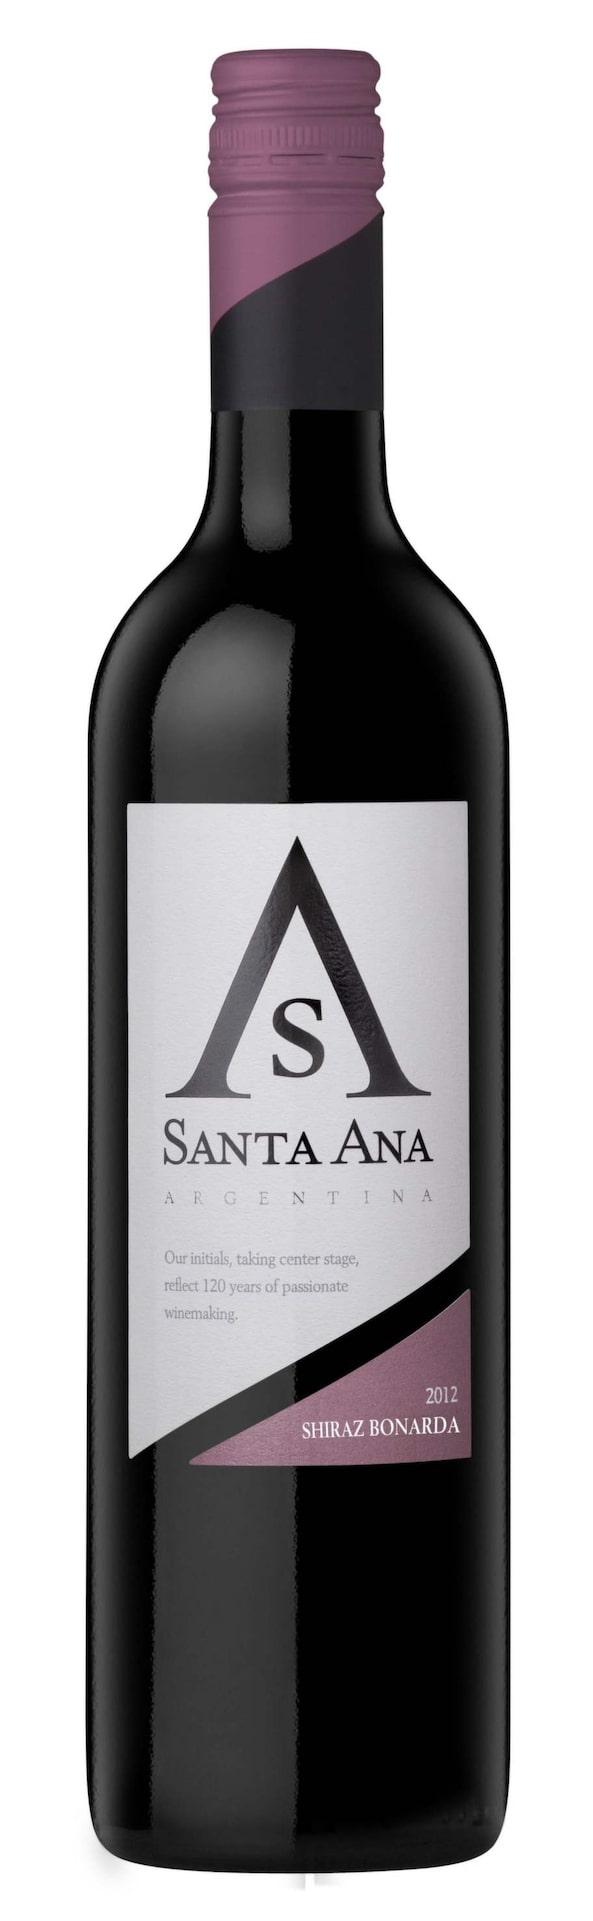 Santa Ana Shiraz Bonarda 2012 (2084) Argentina, 59 kr